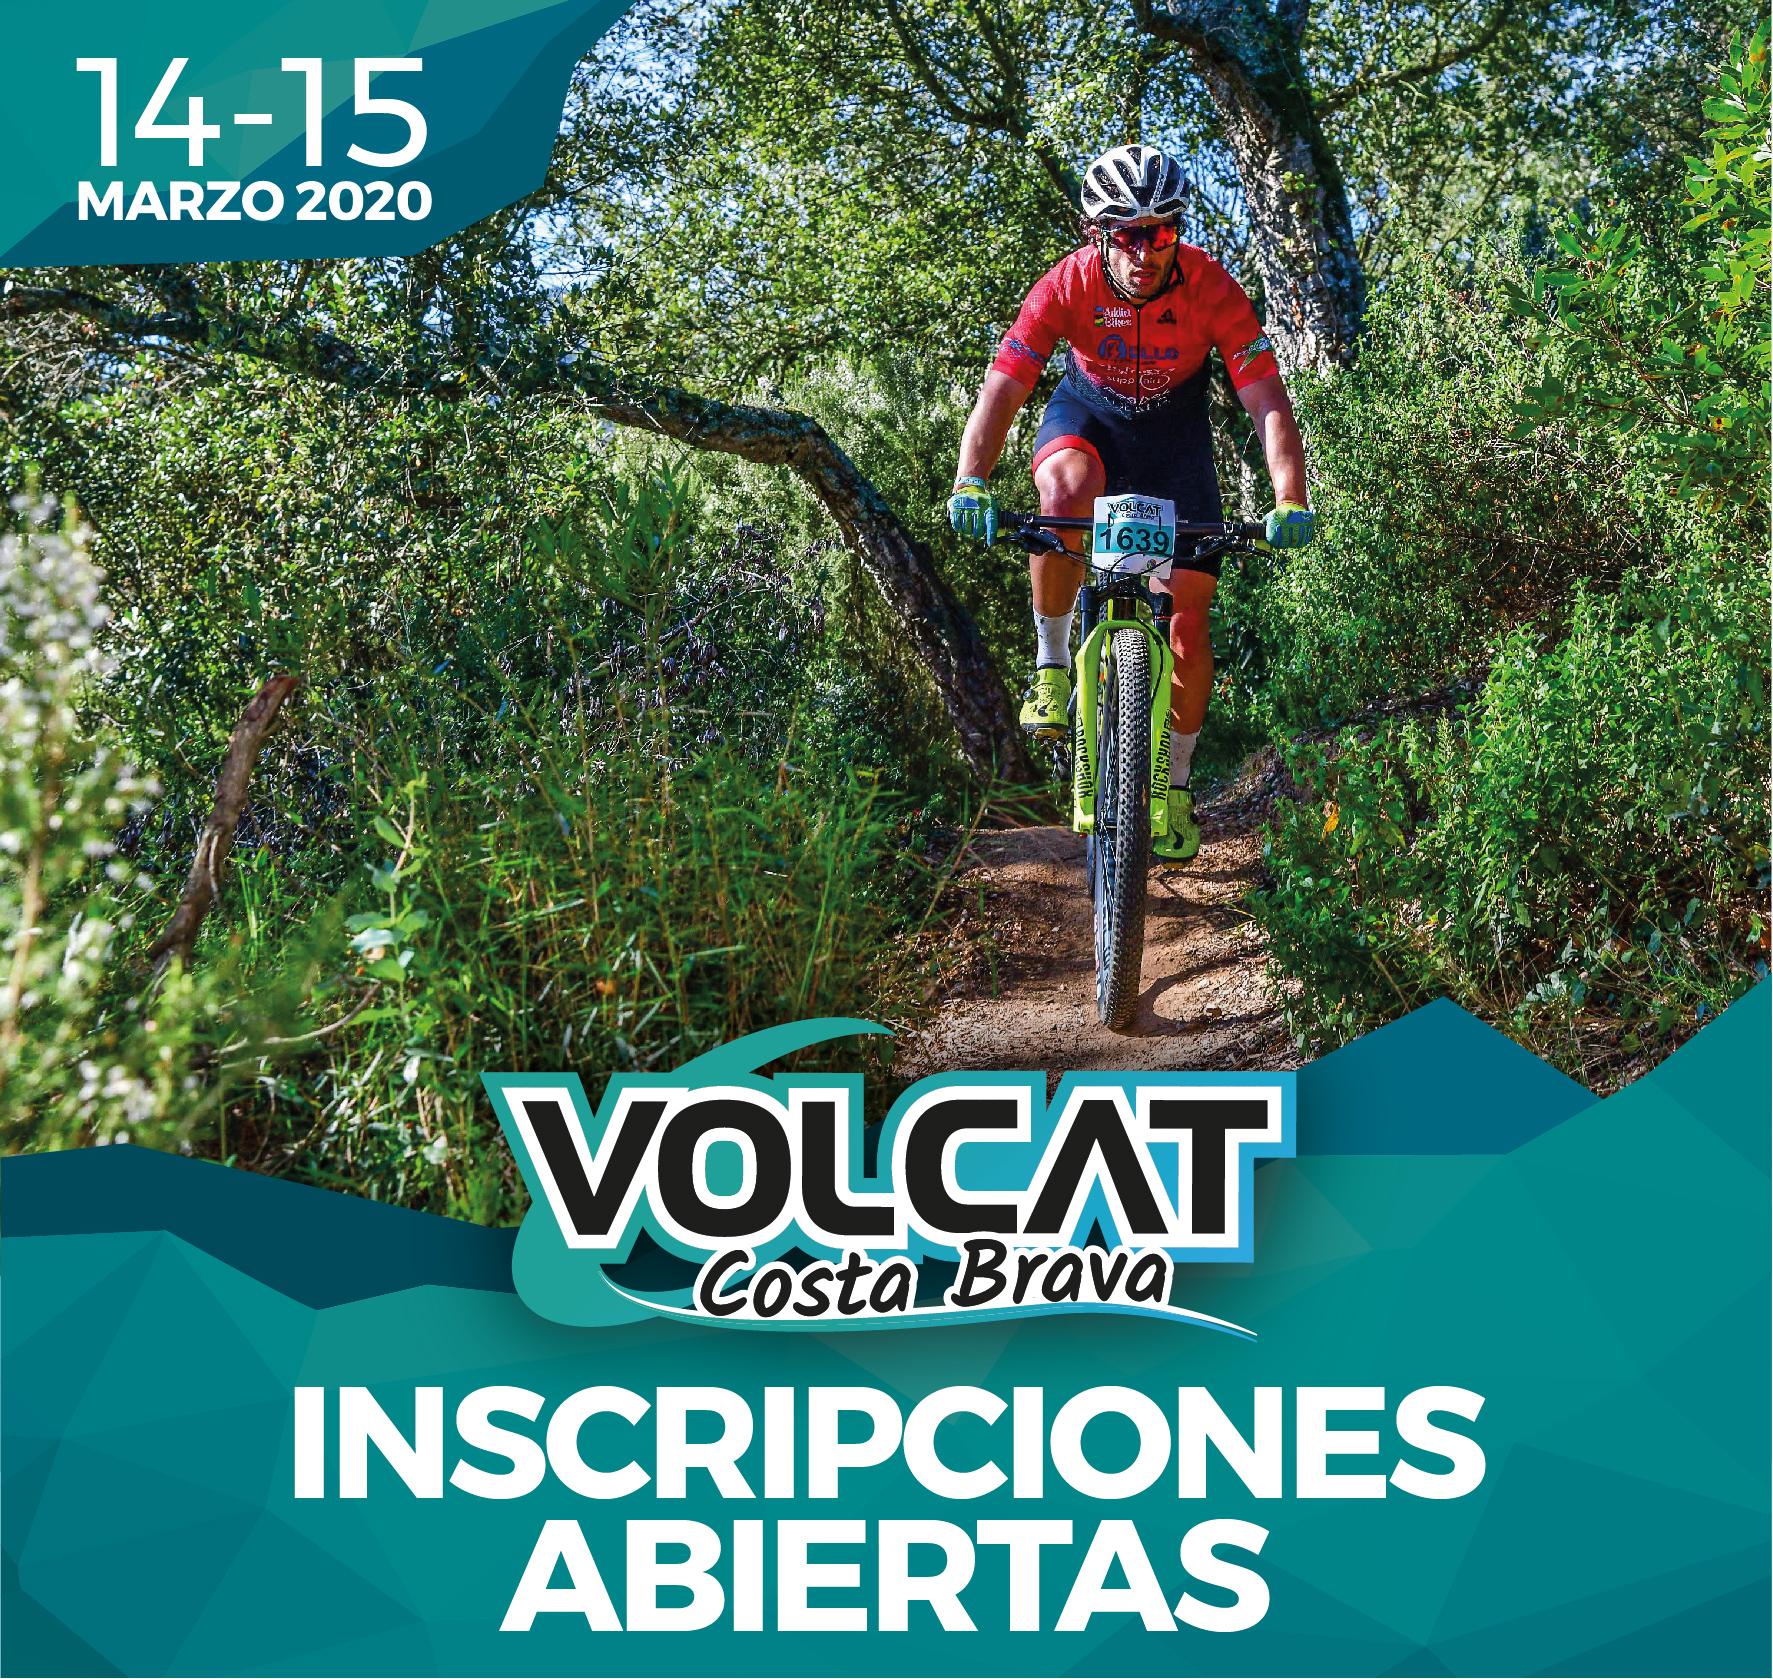 VolCAT Costa Brava 2020 abre inscripciones